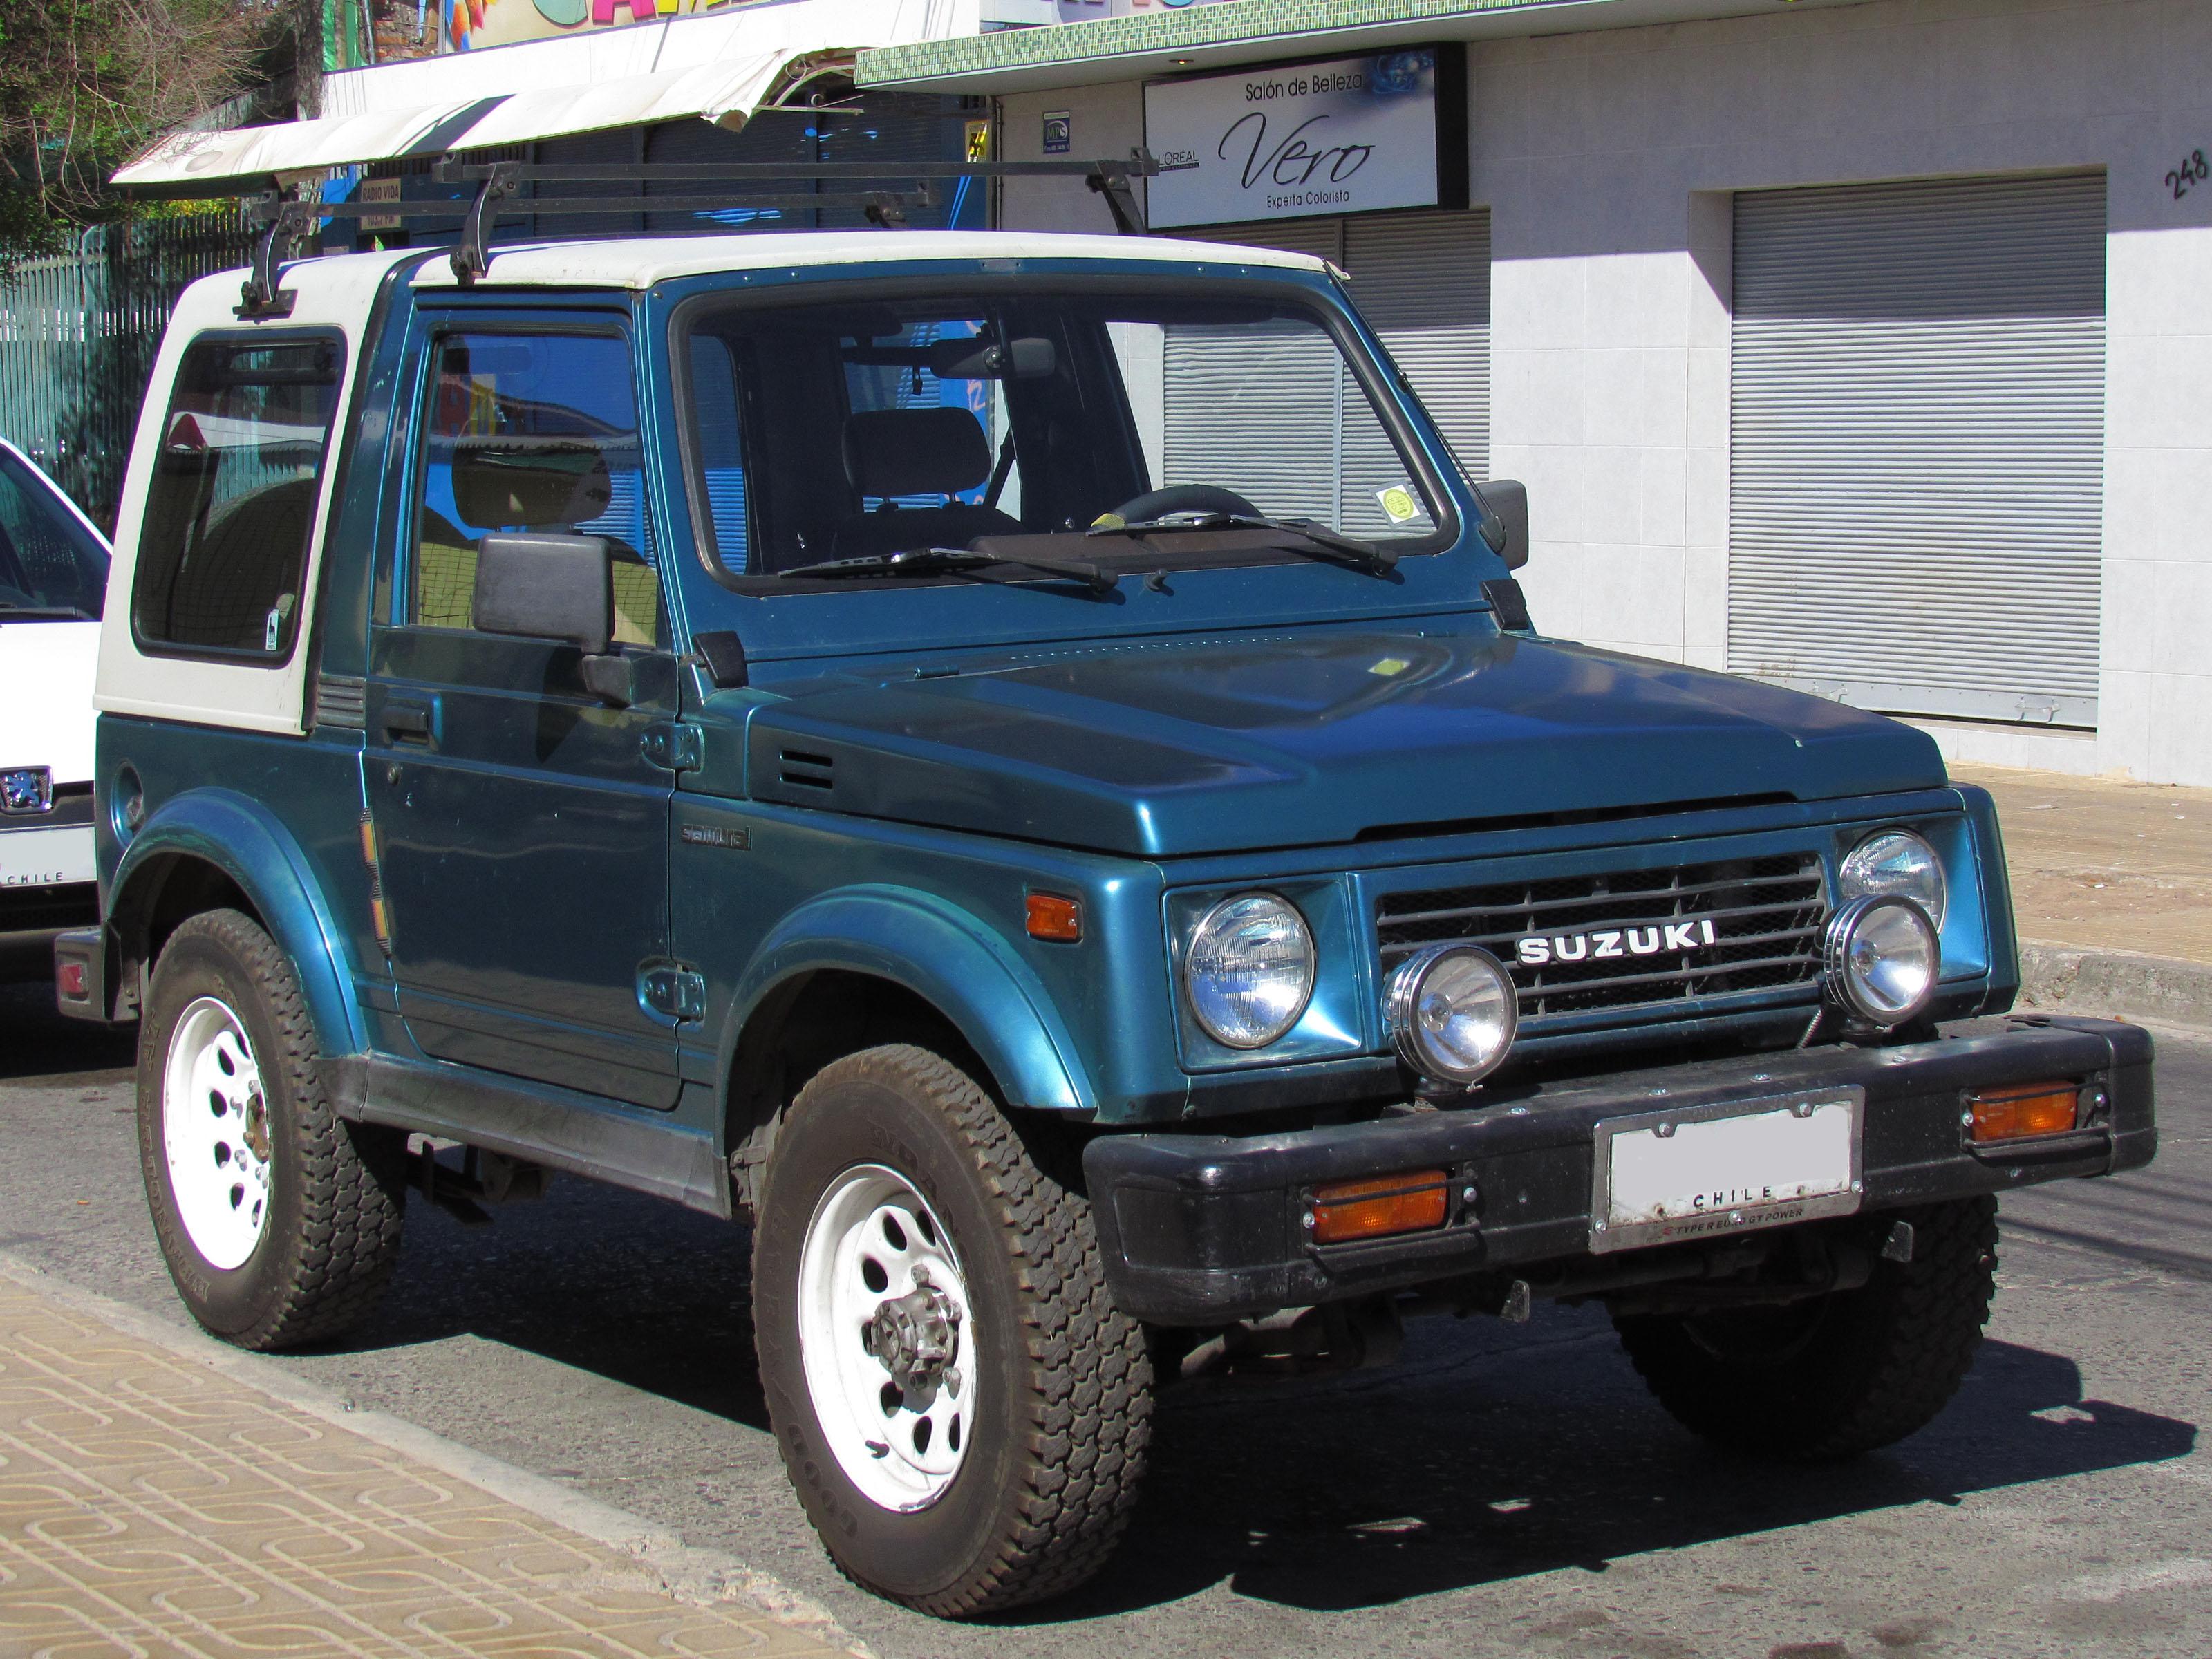 Suzuki Jimny Roof Rack For Sale